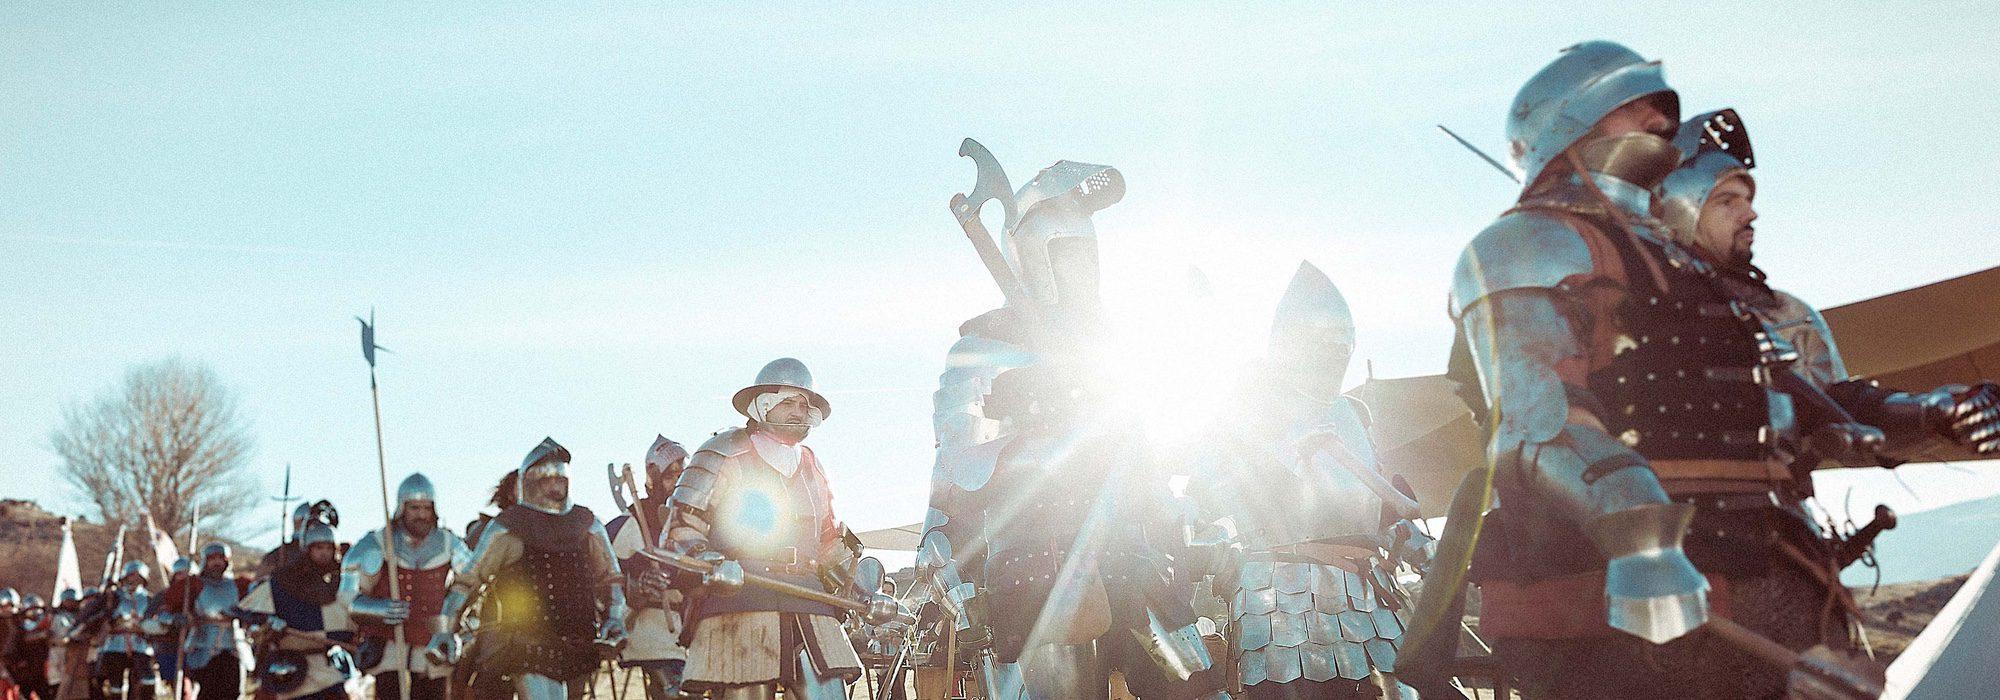 Conquistadores: Adventum